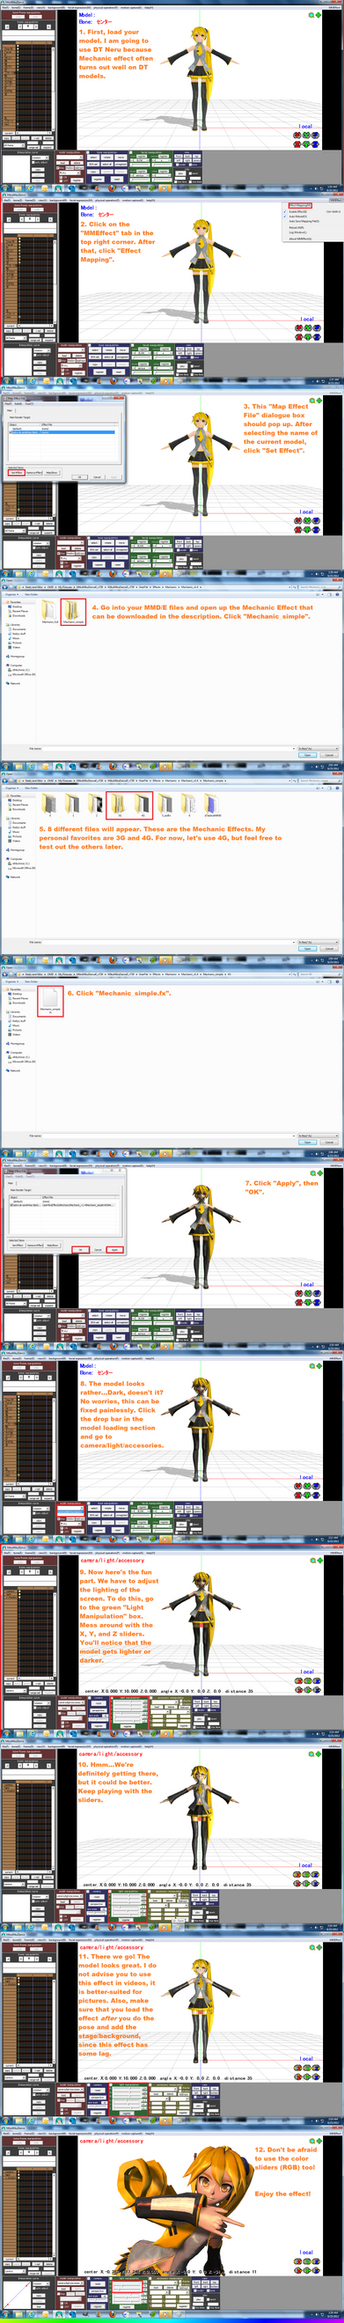 MMD Mechanic Effect Tutorial + DL by AkitaFanZ